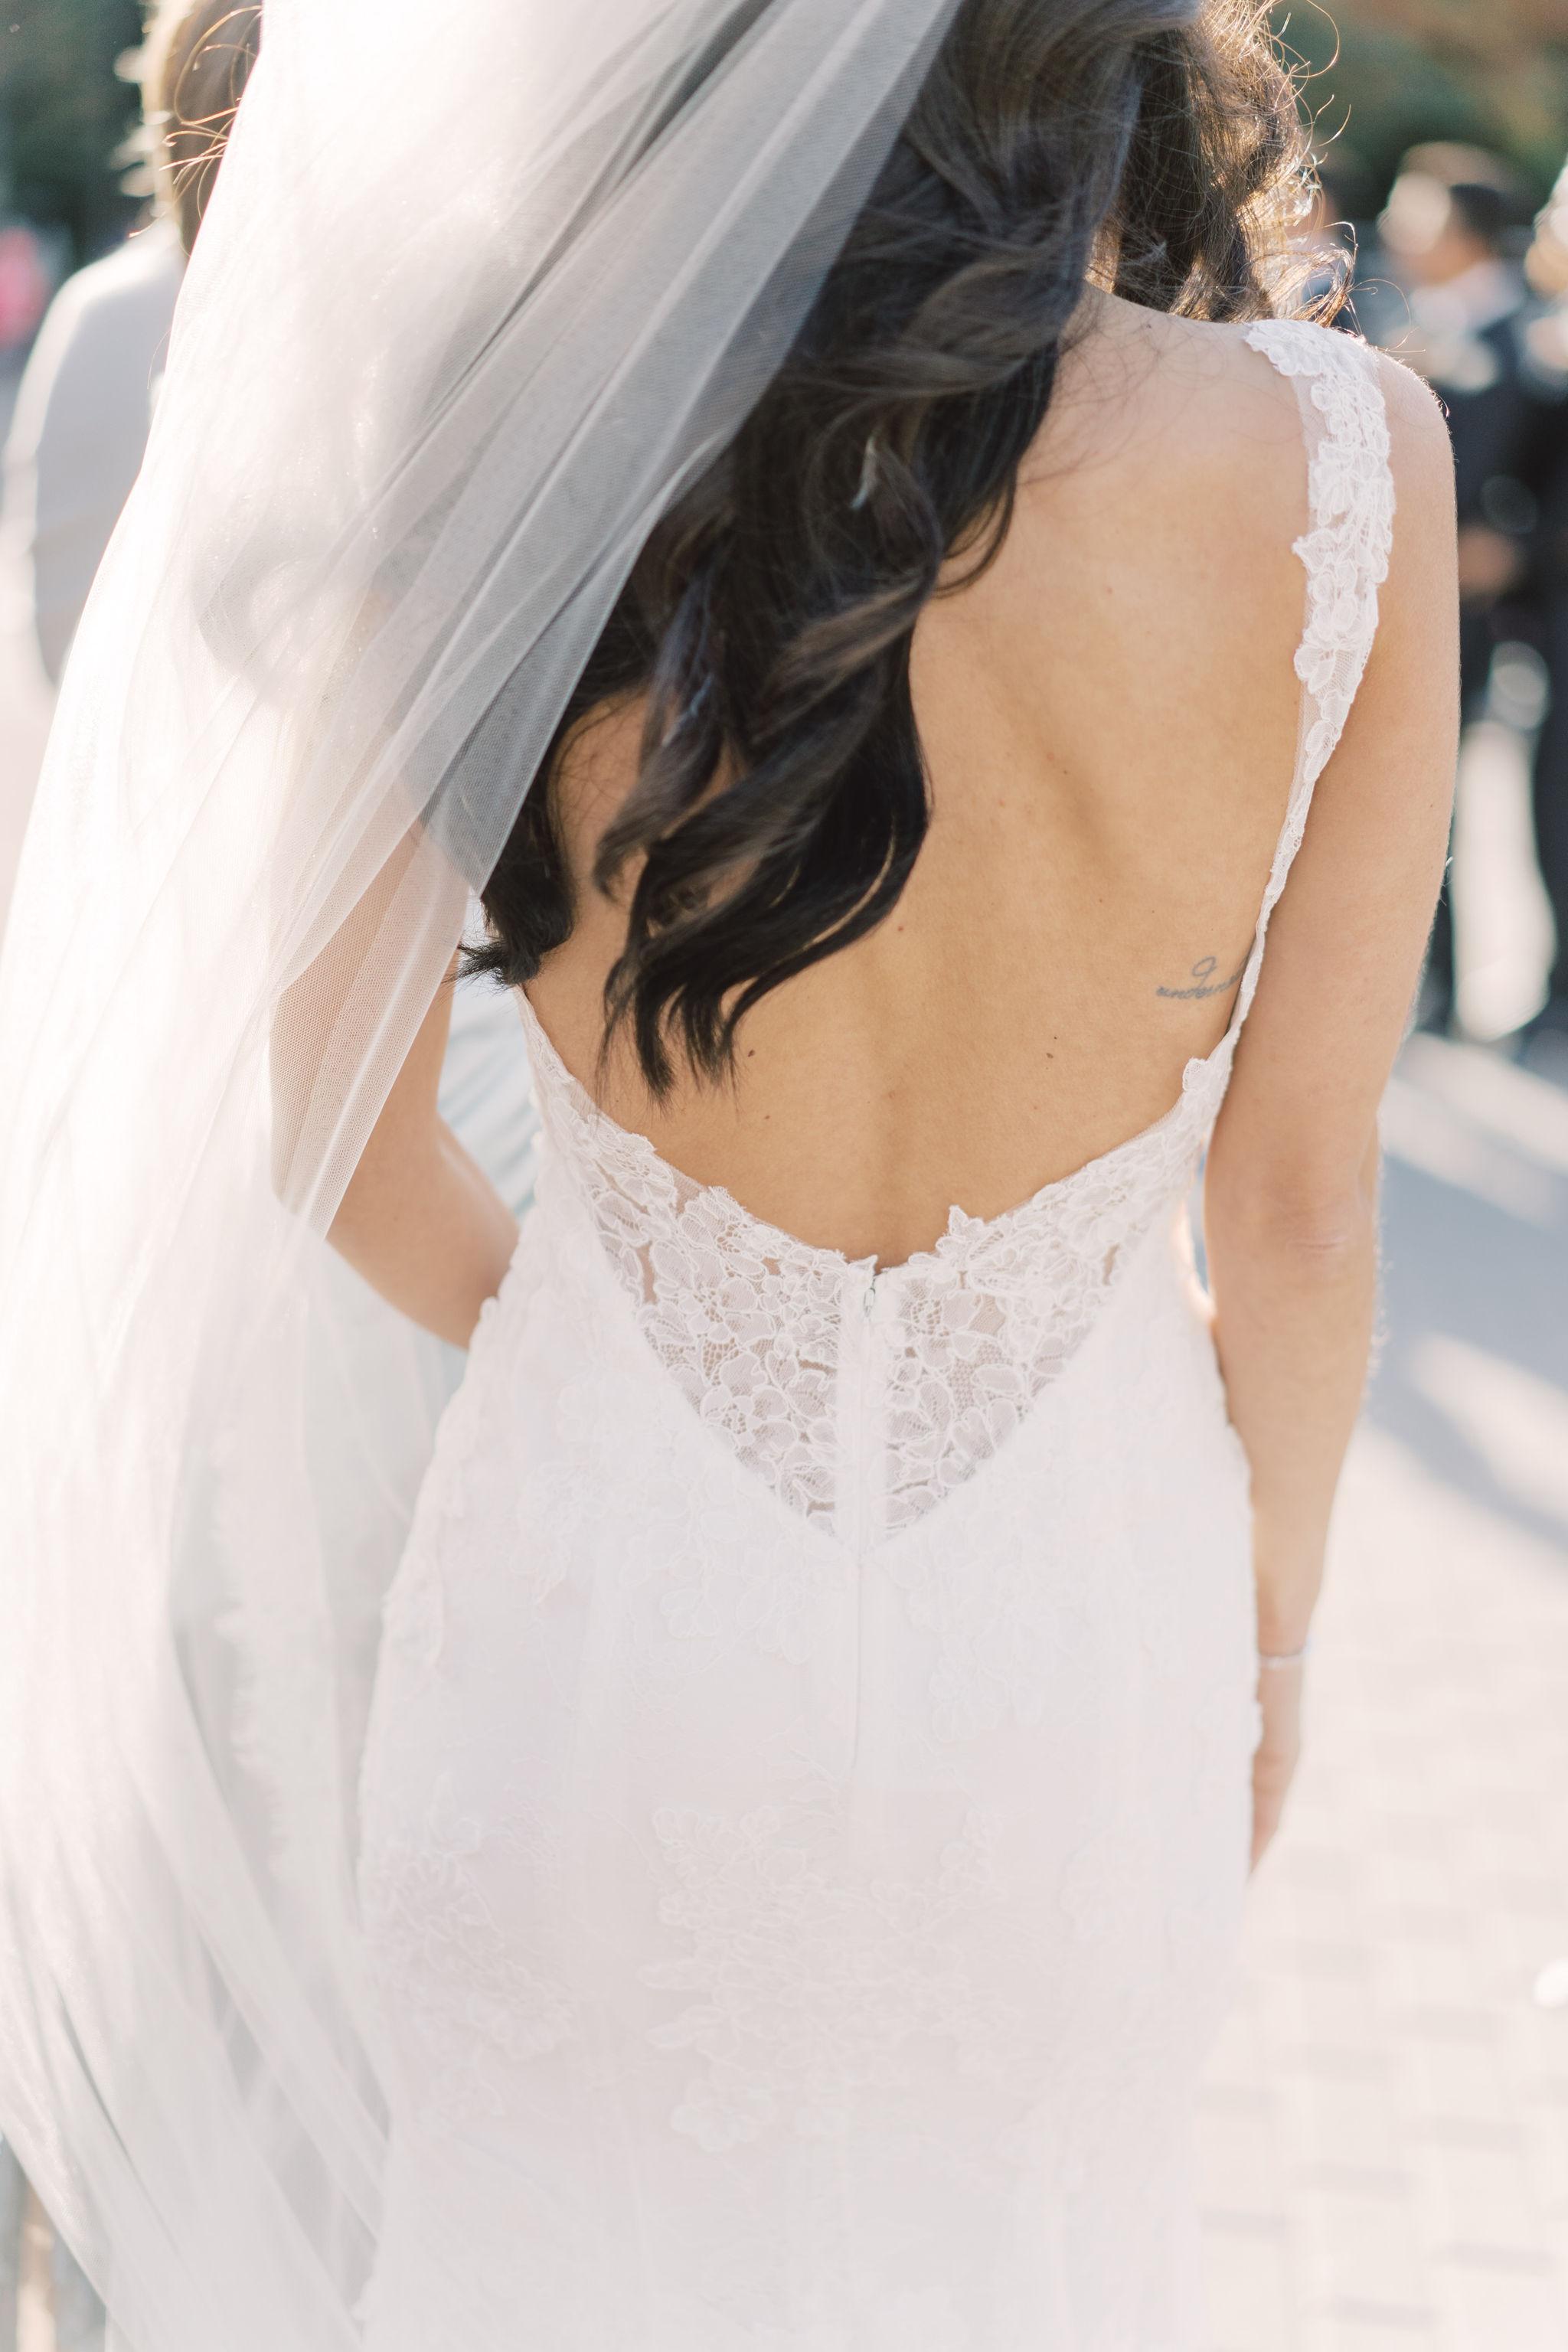 0805-artiese-evergreen-brickworks-wedding-ashleycraig-03432.jpg